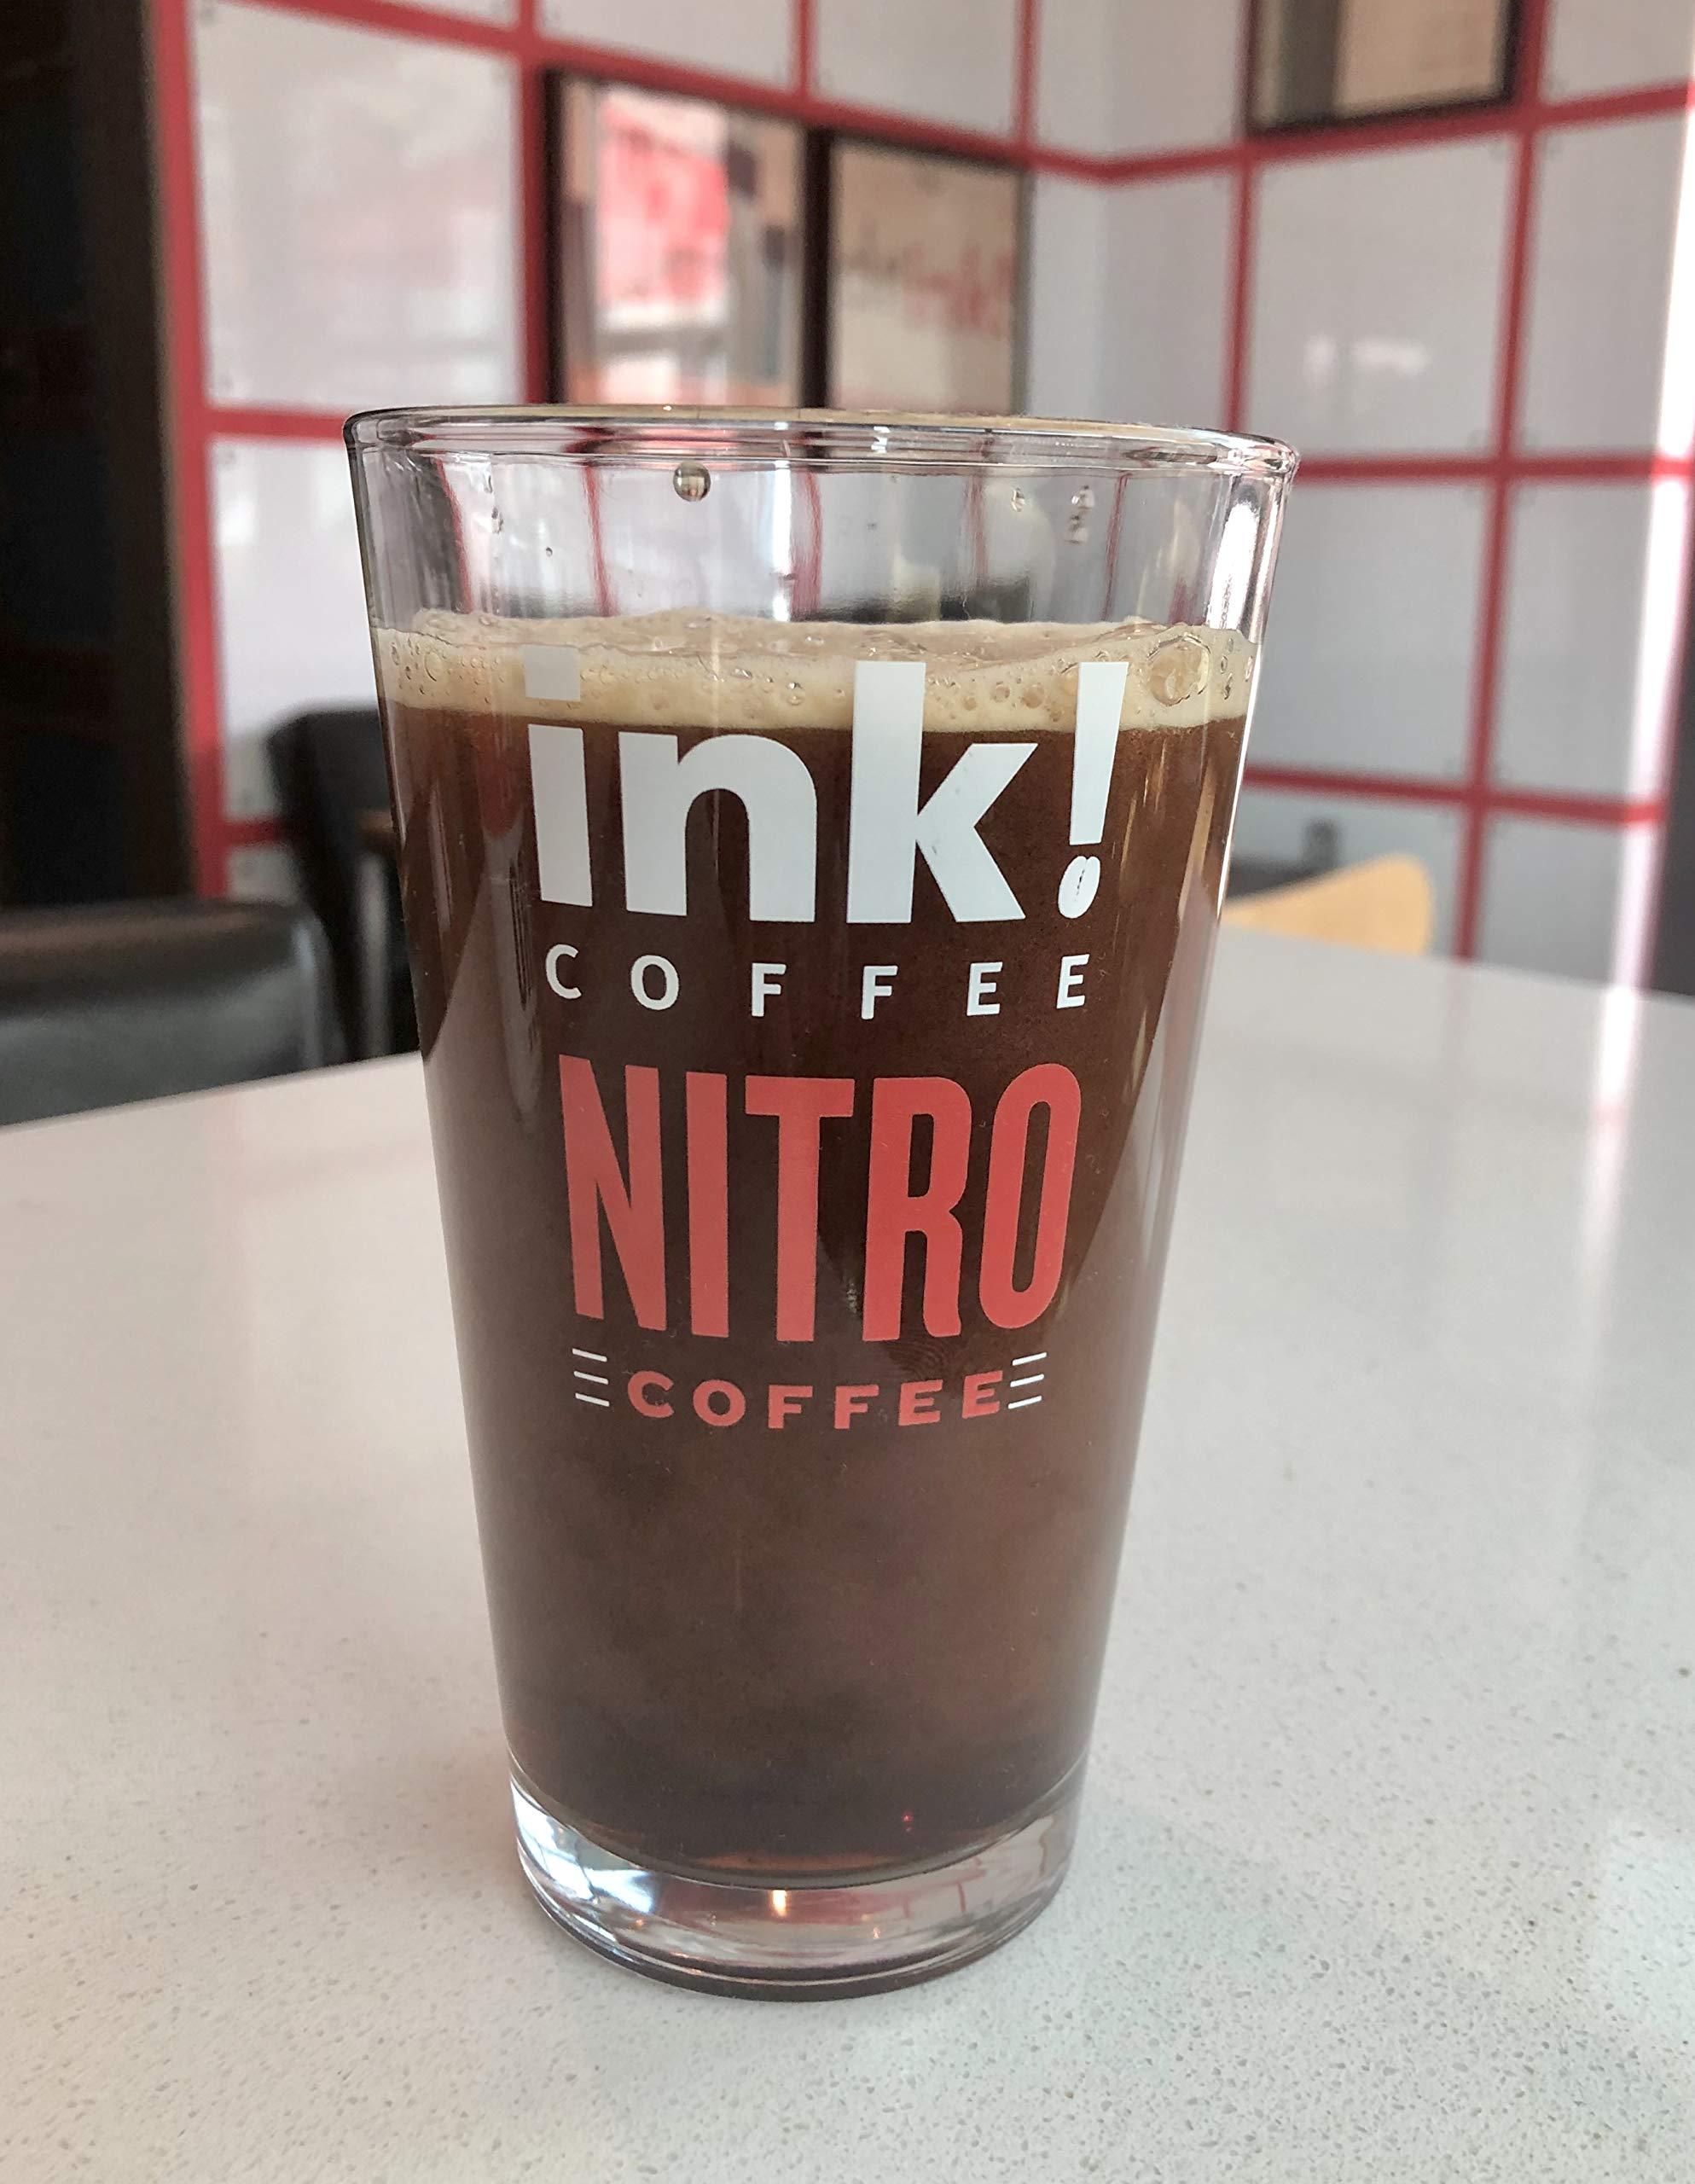 Nitro Coffee is Nature's Energy Drink! 230mg Caffeine, Zero Calories, Sugar Free, 8 x 12oz cans